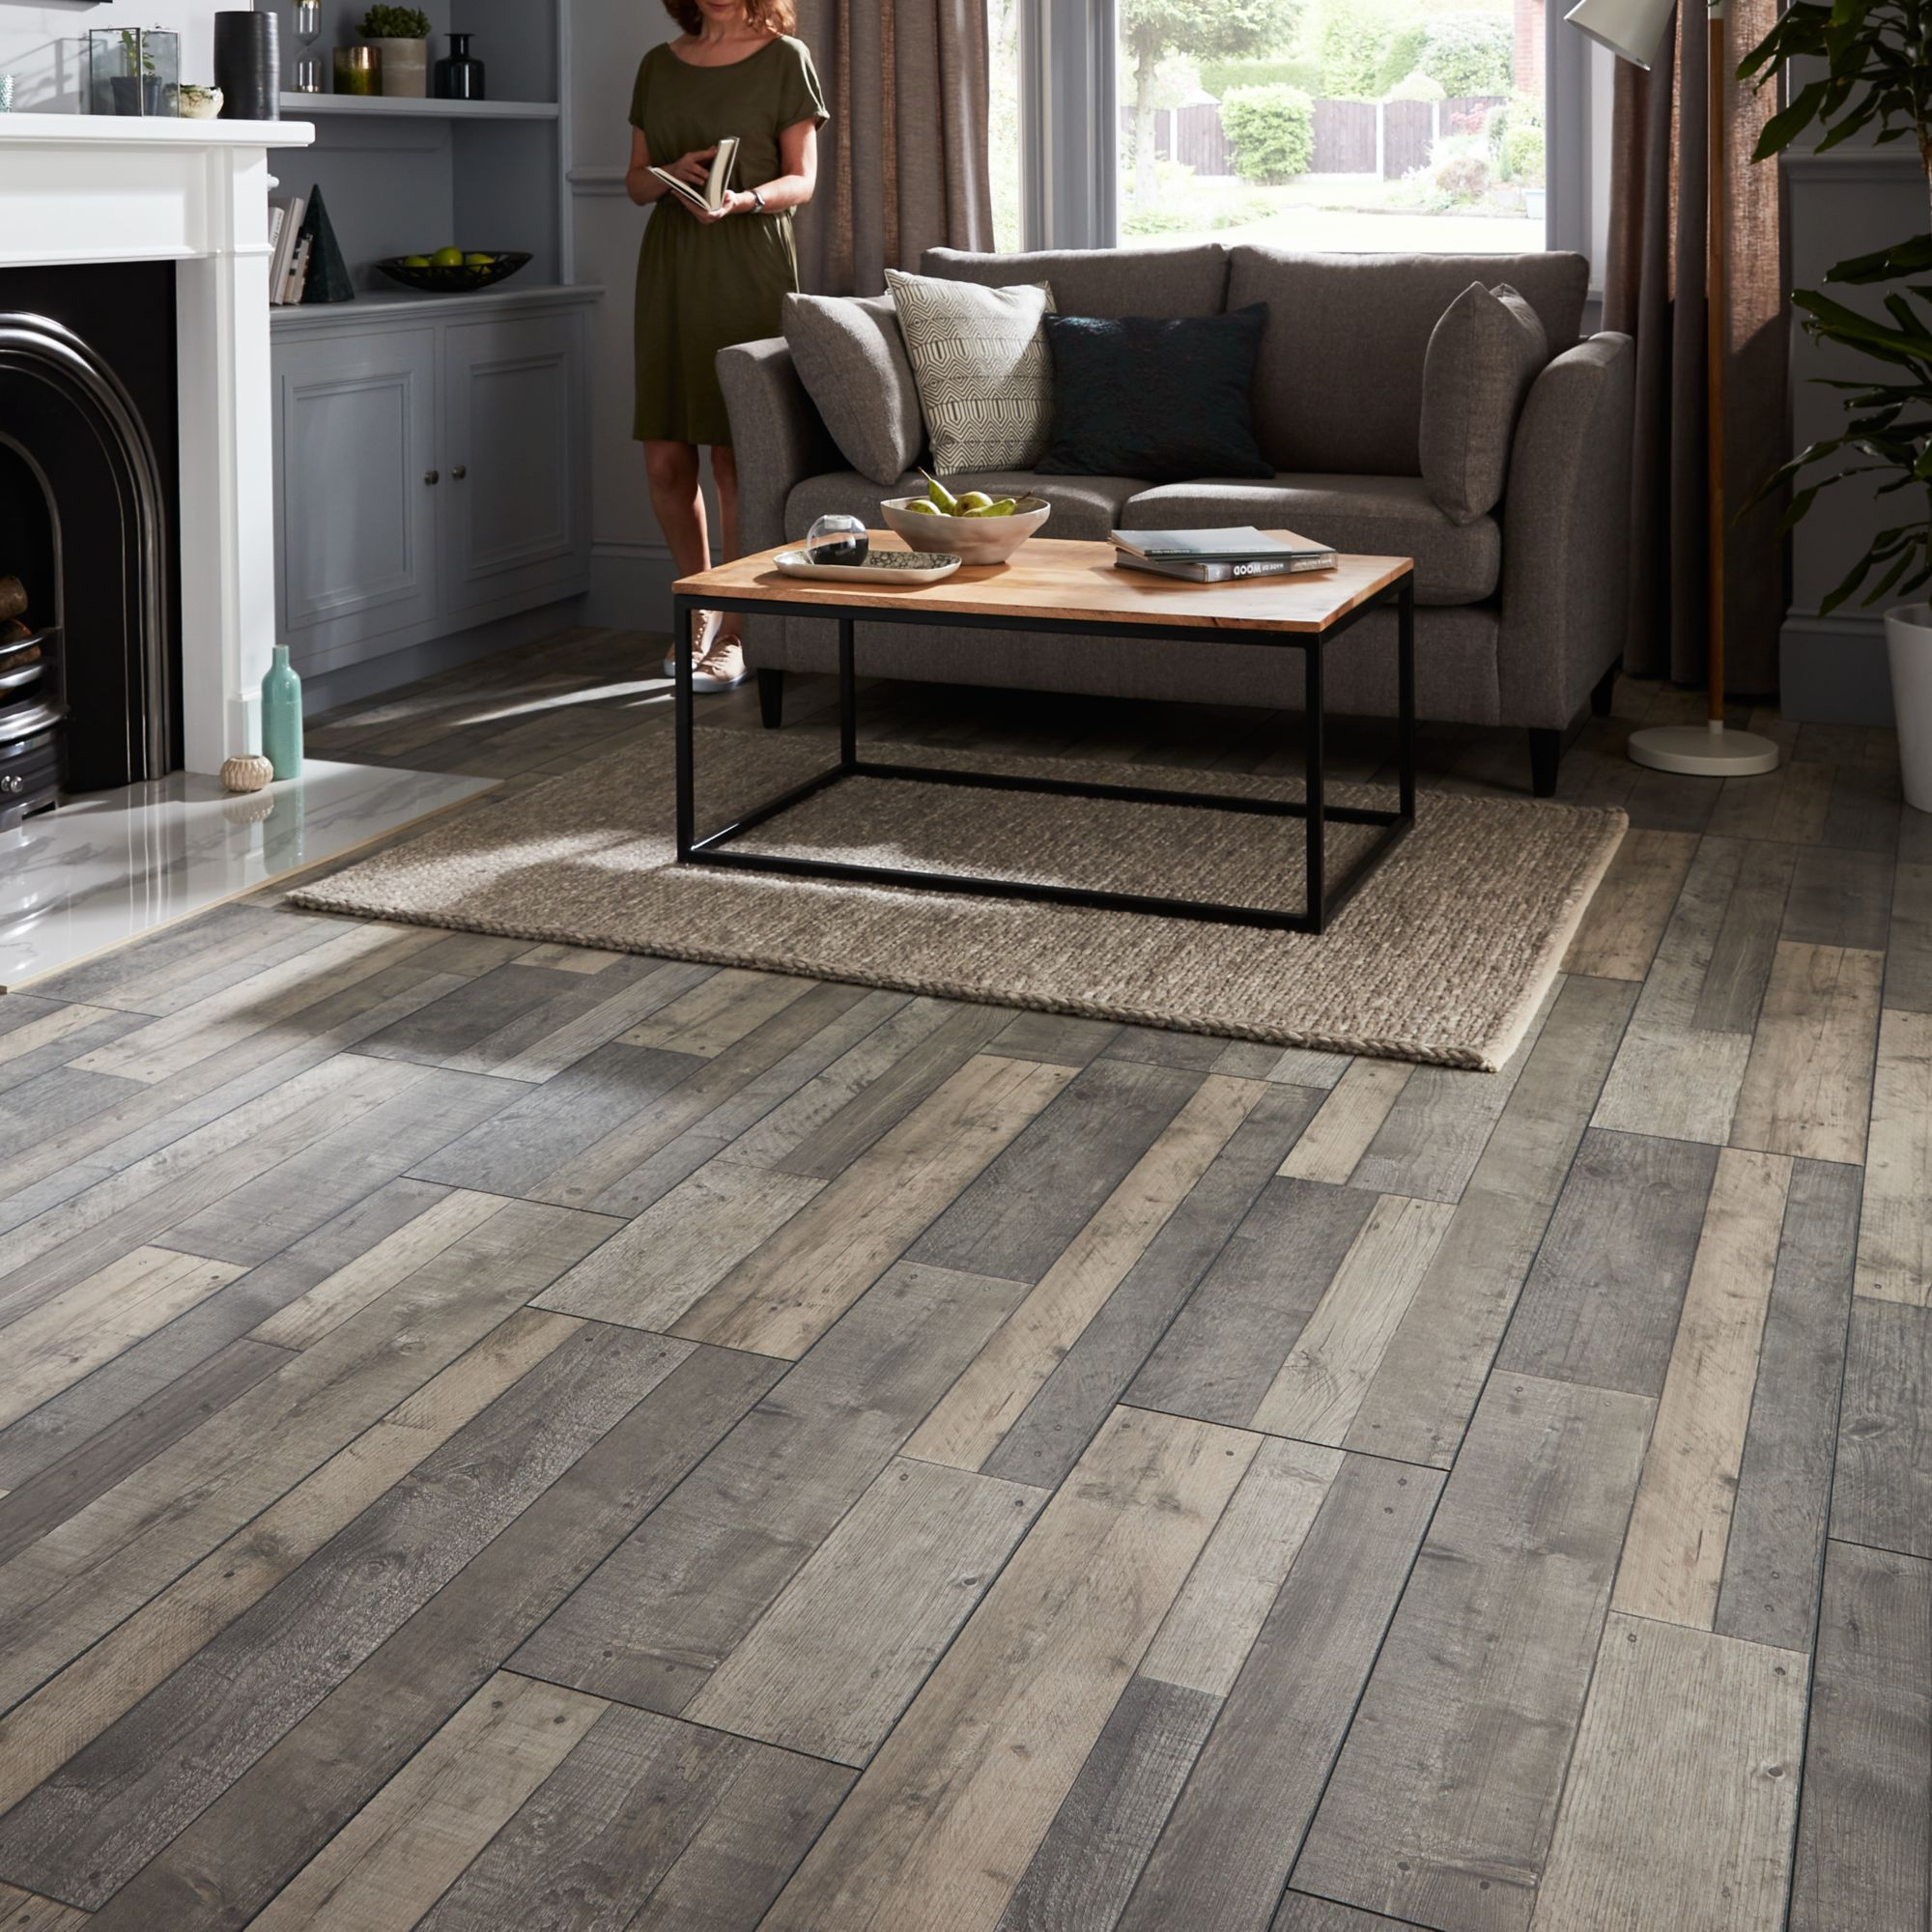 Goodhome Dunwich Grey Oak Effect Laminate Flooring 2 18m Pack Departments Diy At B Q